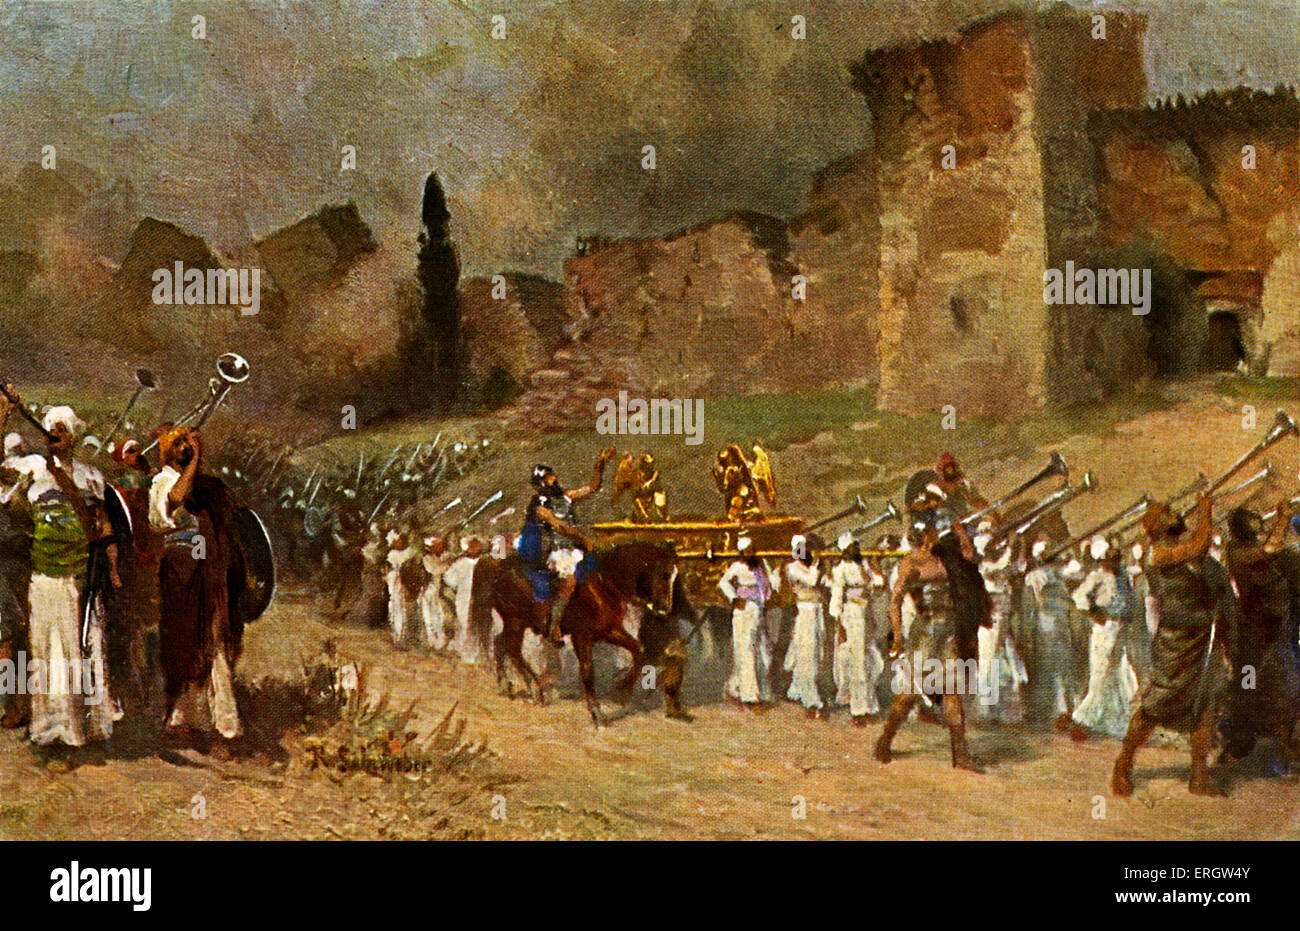 Destruction Of The Walls Jericho